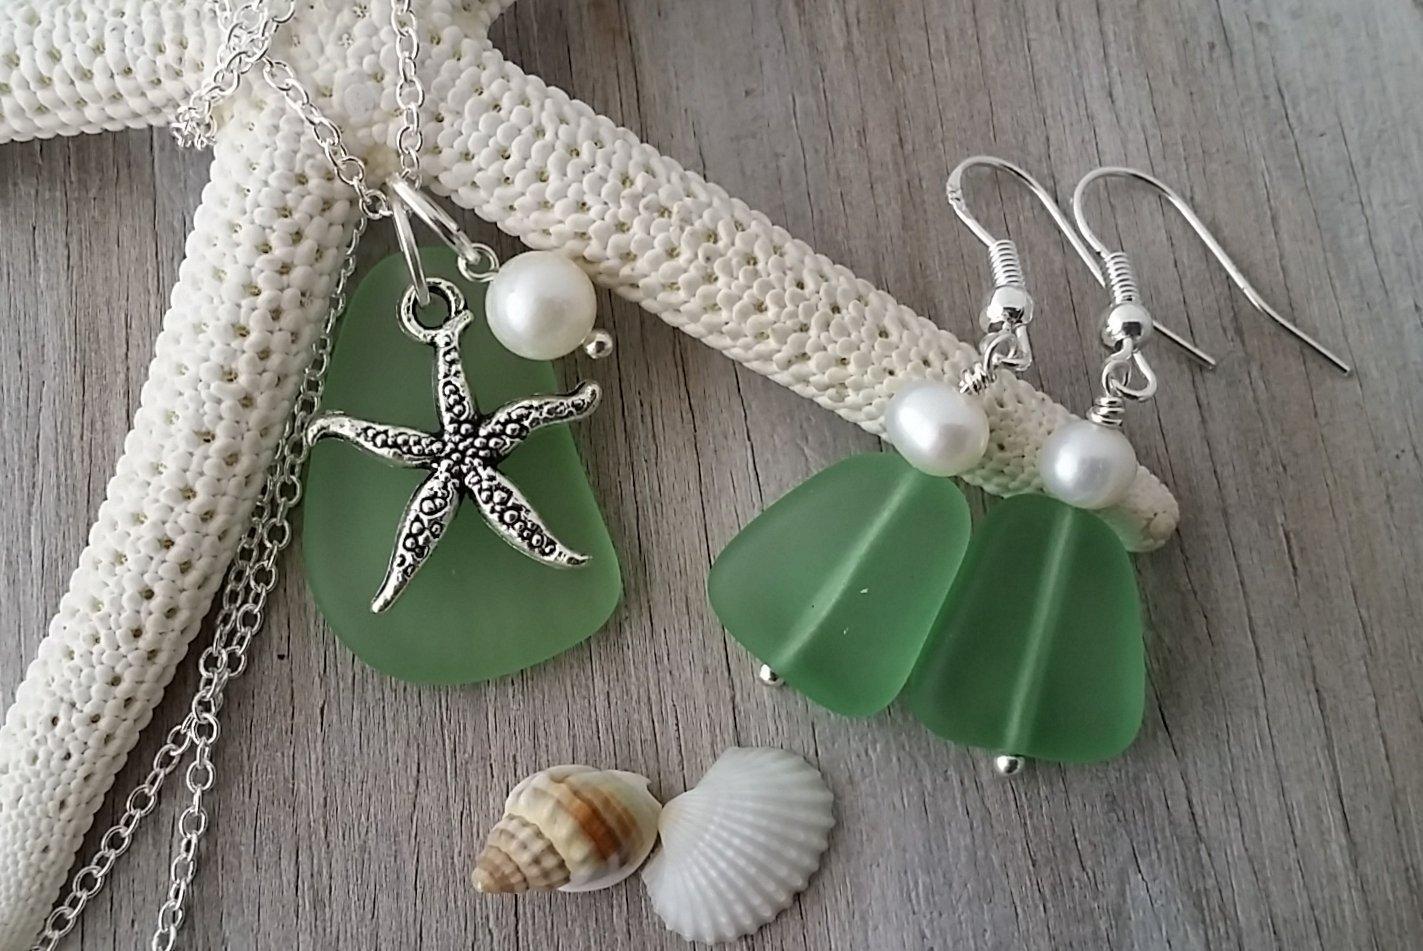 Handmade in Hawaii, green peridot sea glass necklace + earrings jewelry set, fresh water pearl, starfish charm, August birthstone, sea glass jewelry, Hawaiian Gift, FREE gift wrap, FREE gift message